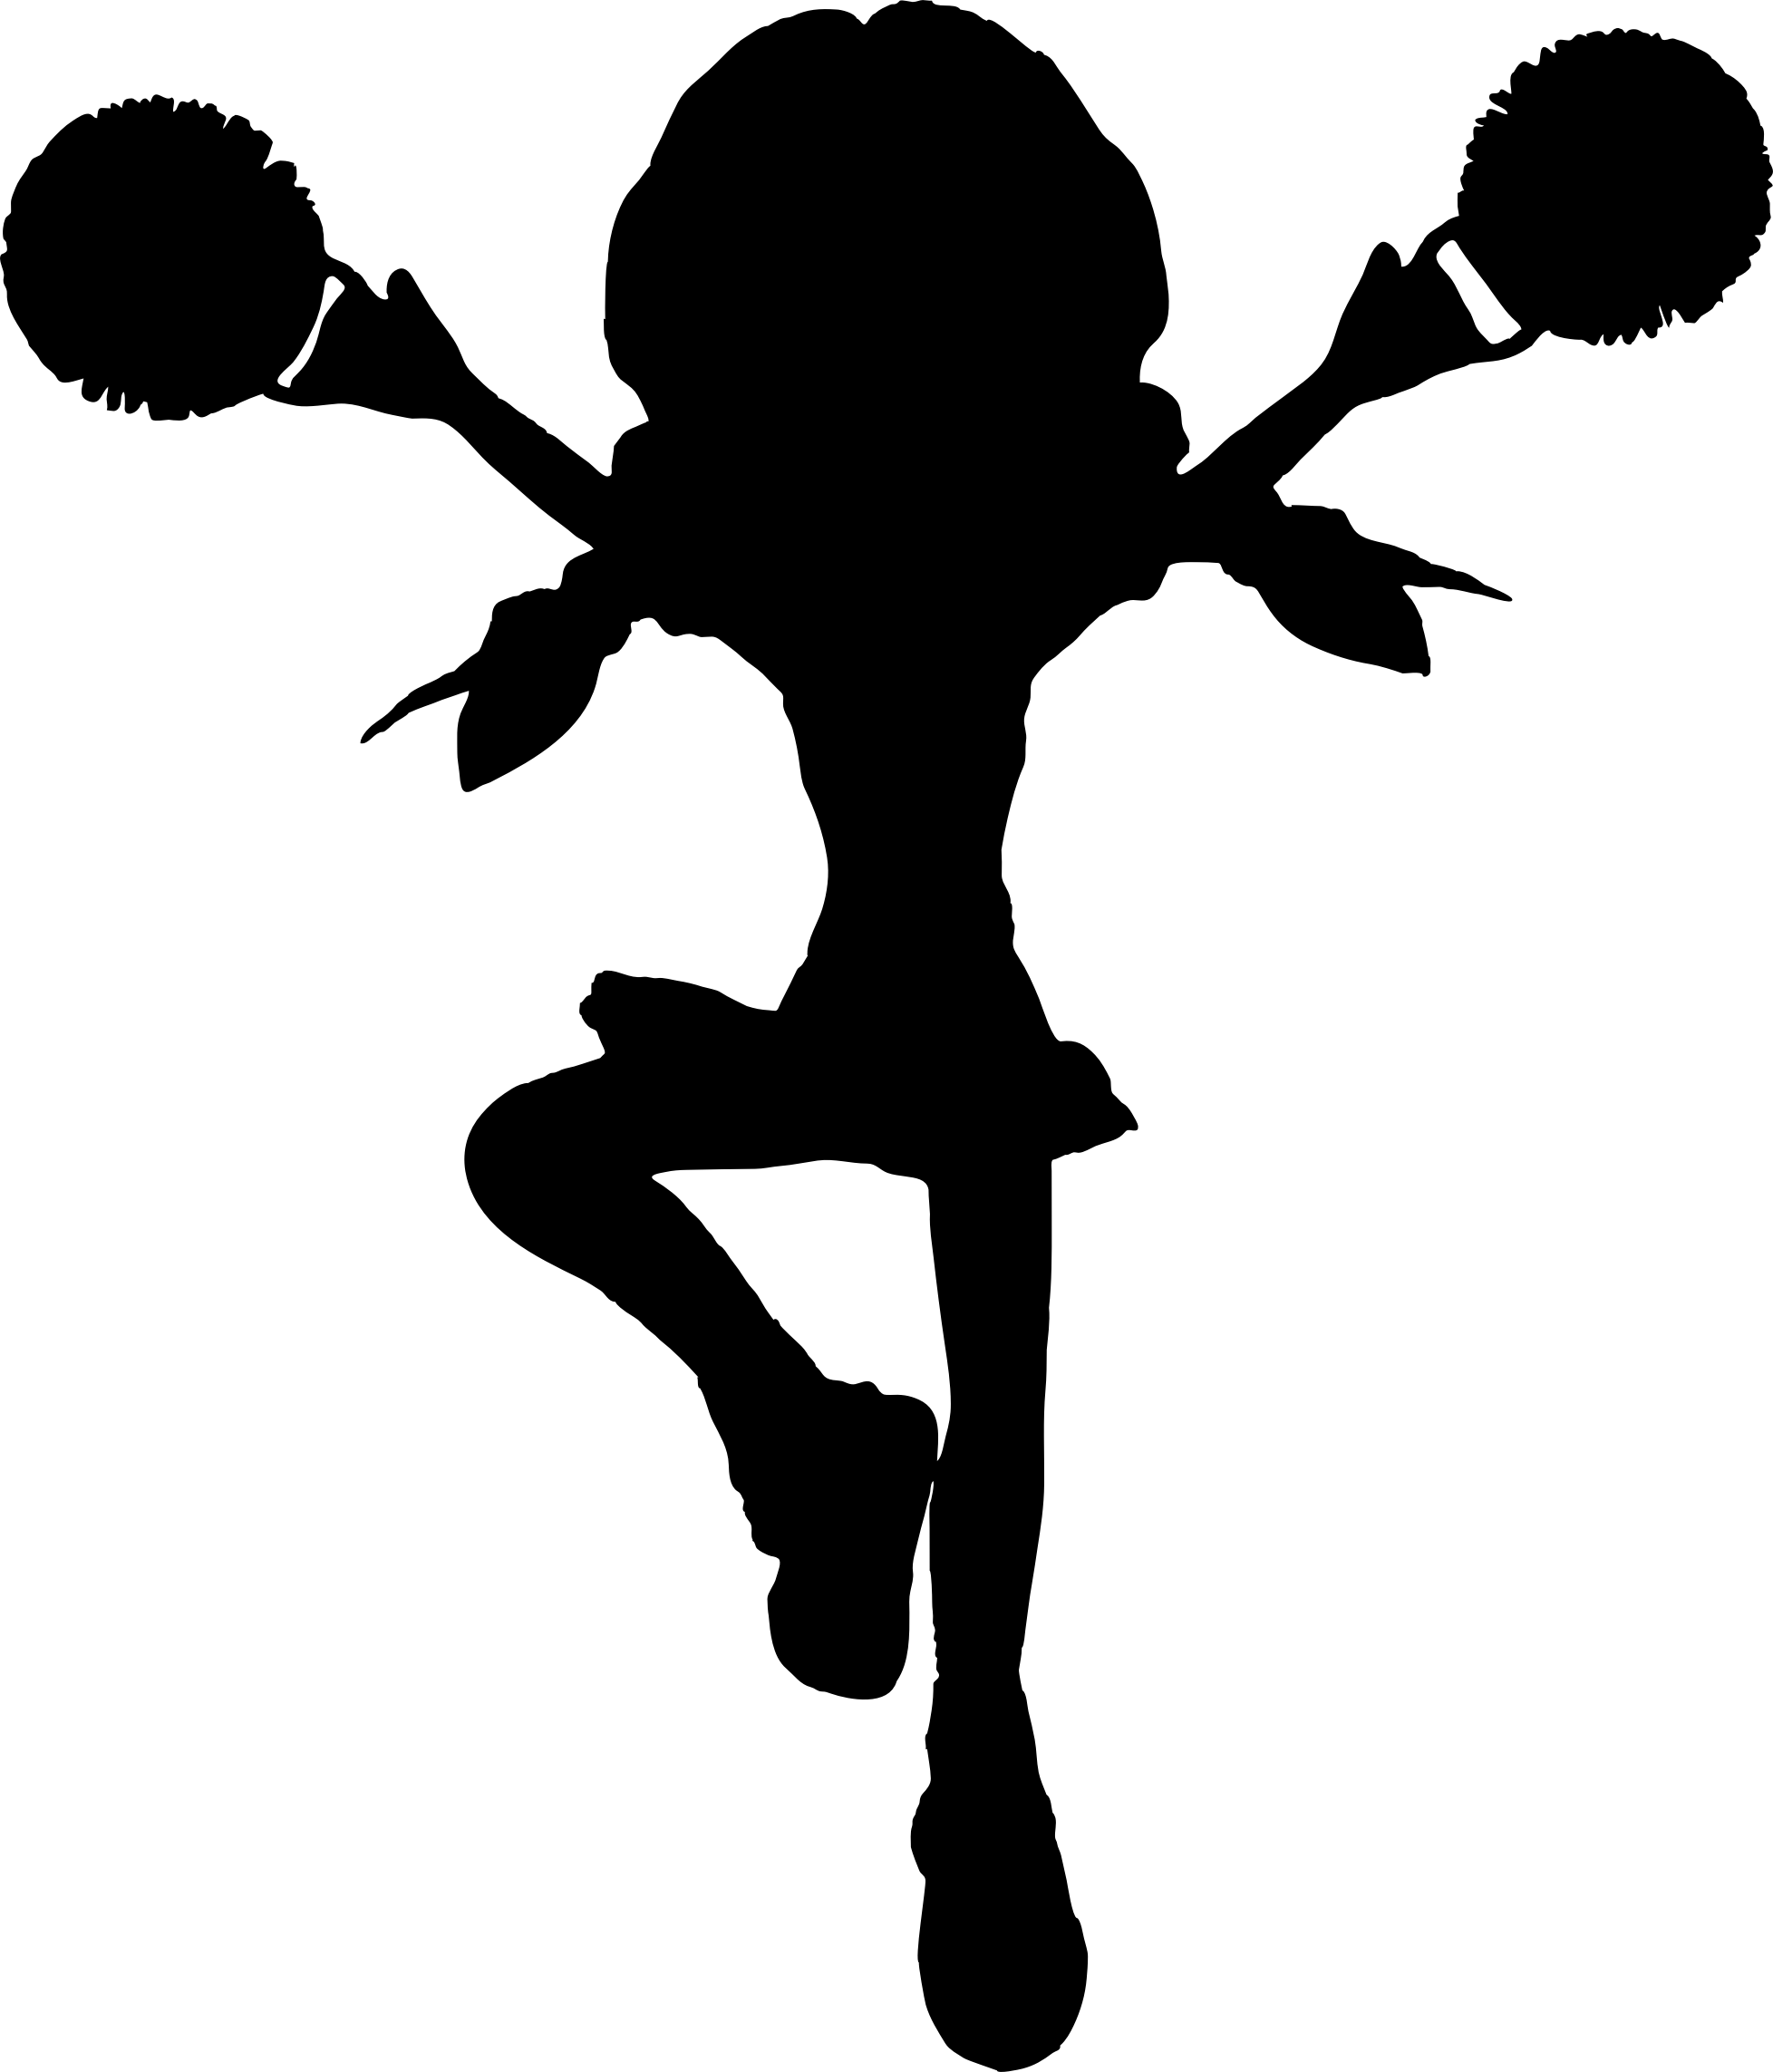 Clipart kids cheerleader. Cartoon silhouette